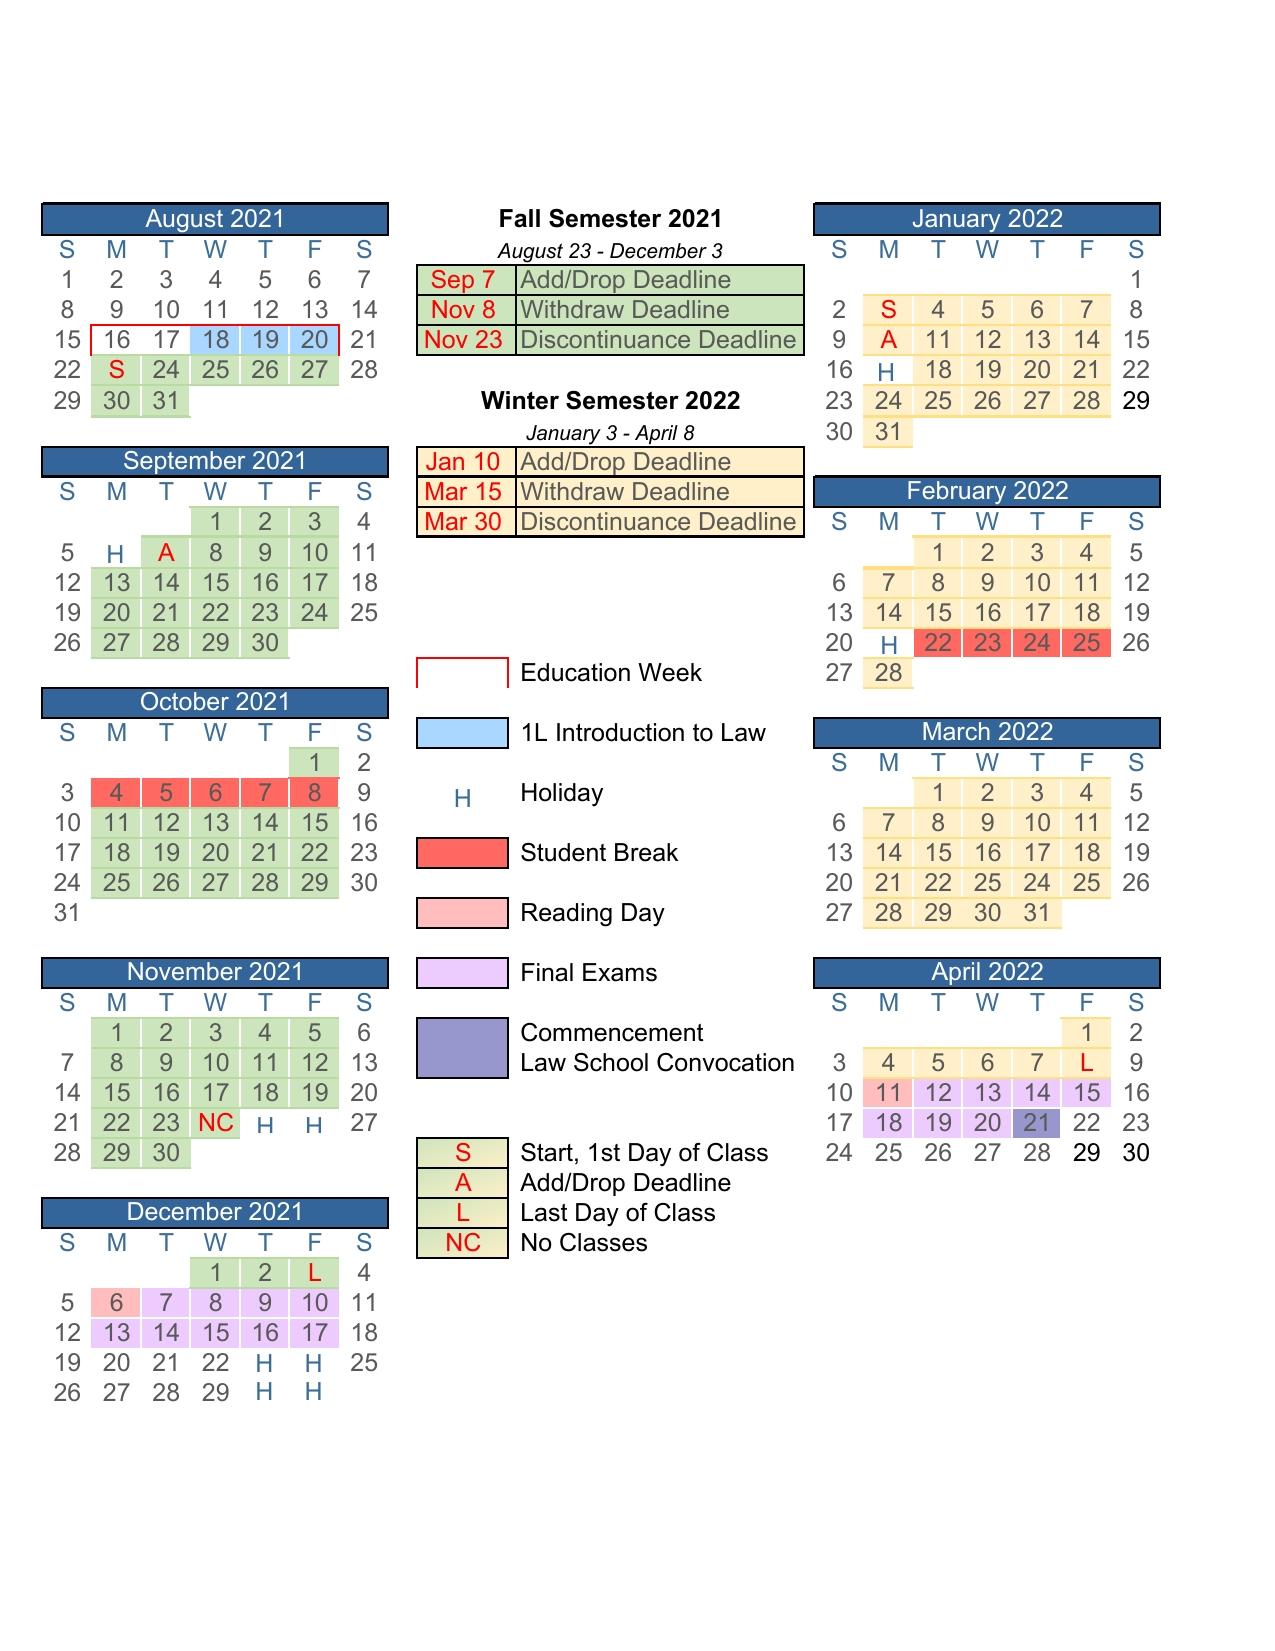 Academic Calendar - Byu J. Reuben Clark Law School